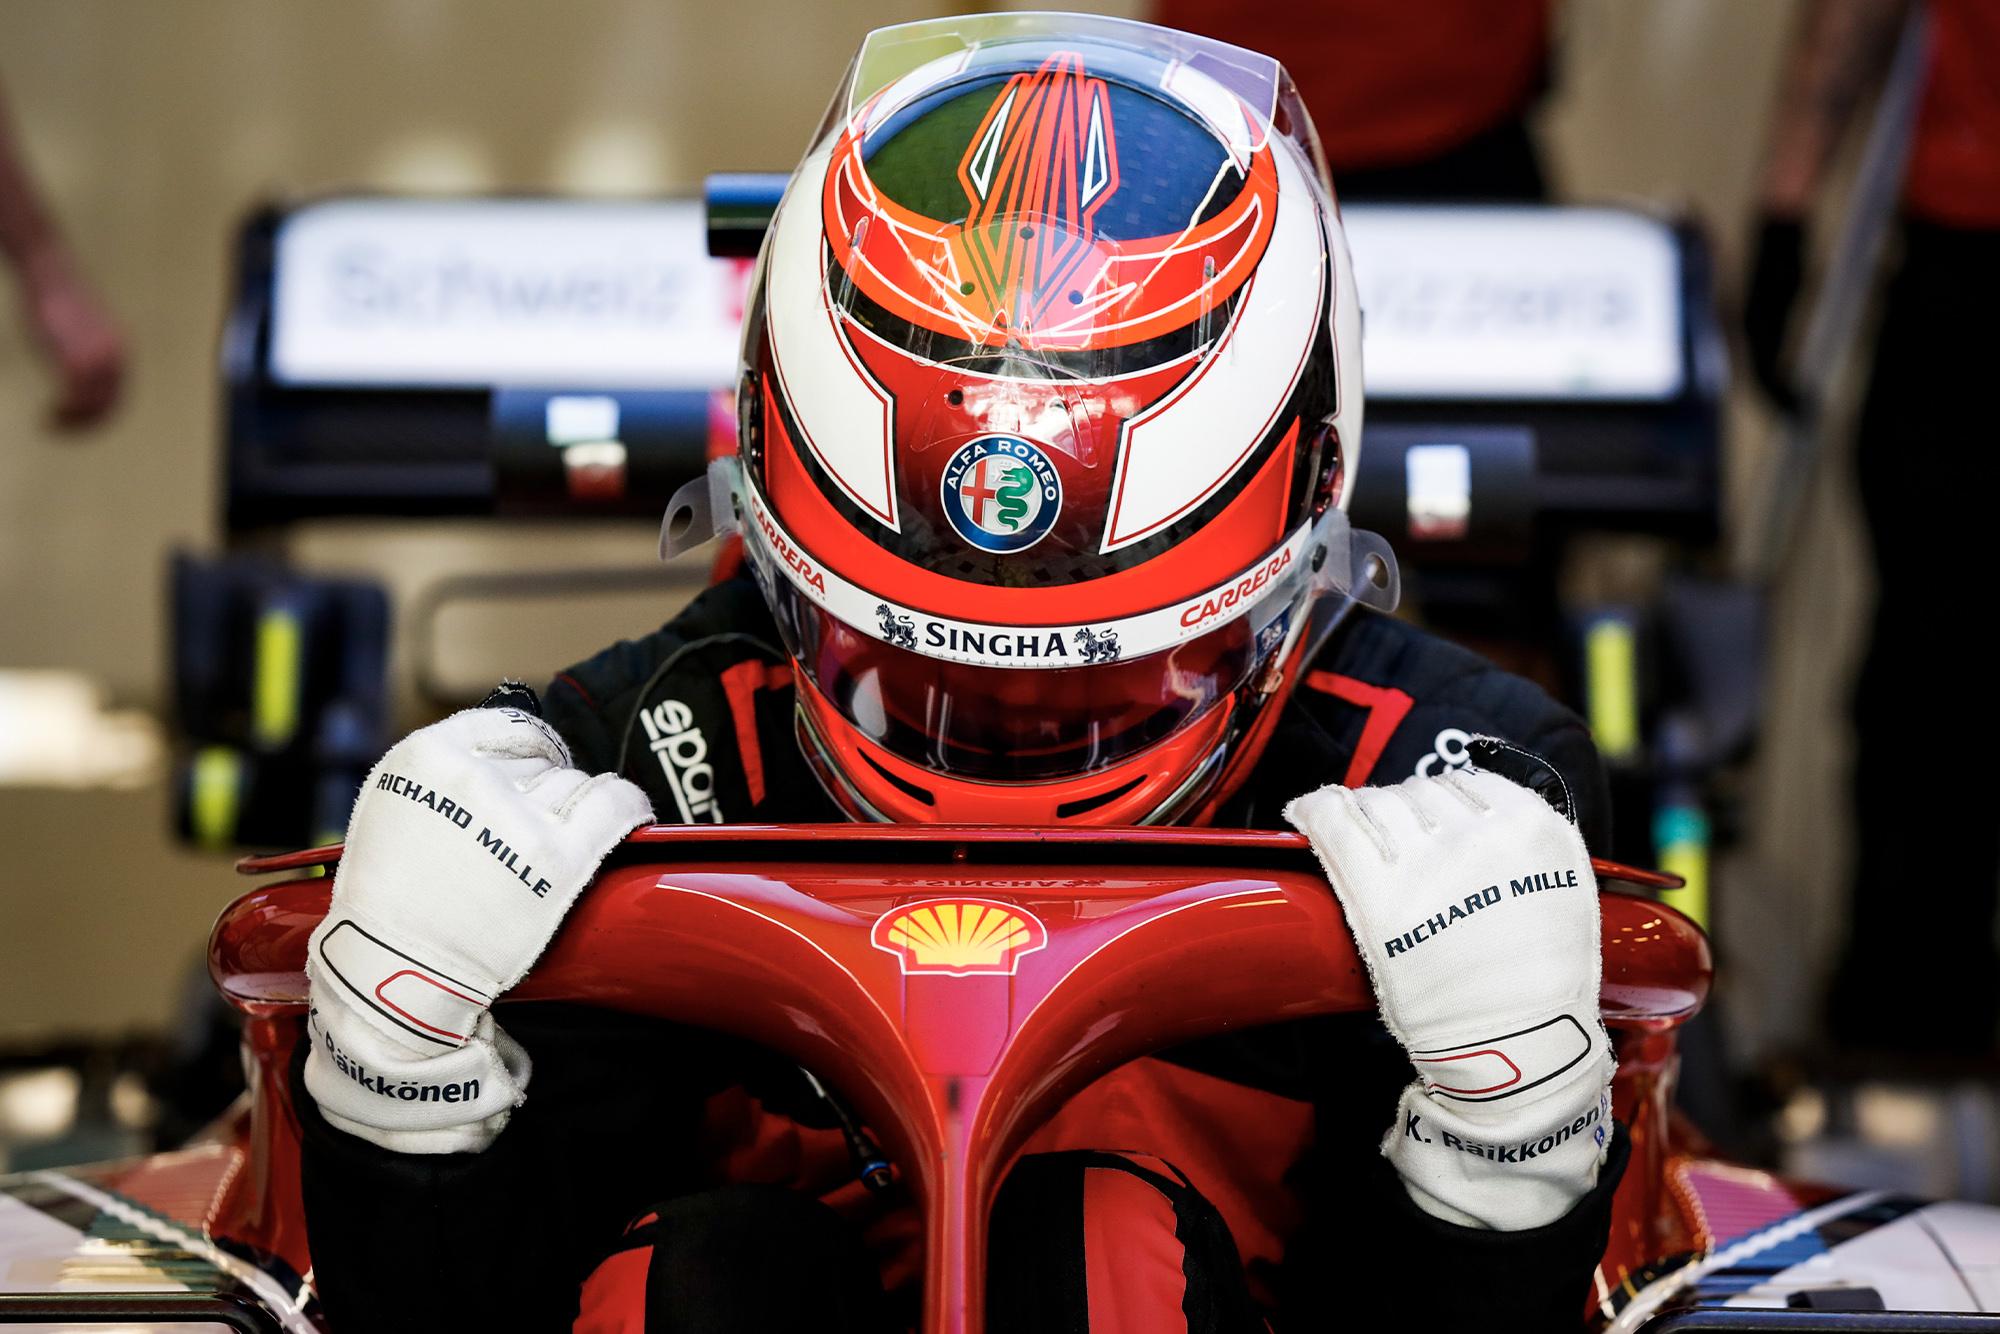 Kimi Raikkonen lowers himself into his Alfa Romeo in 2019